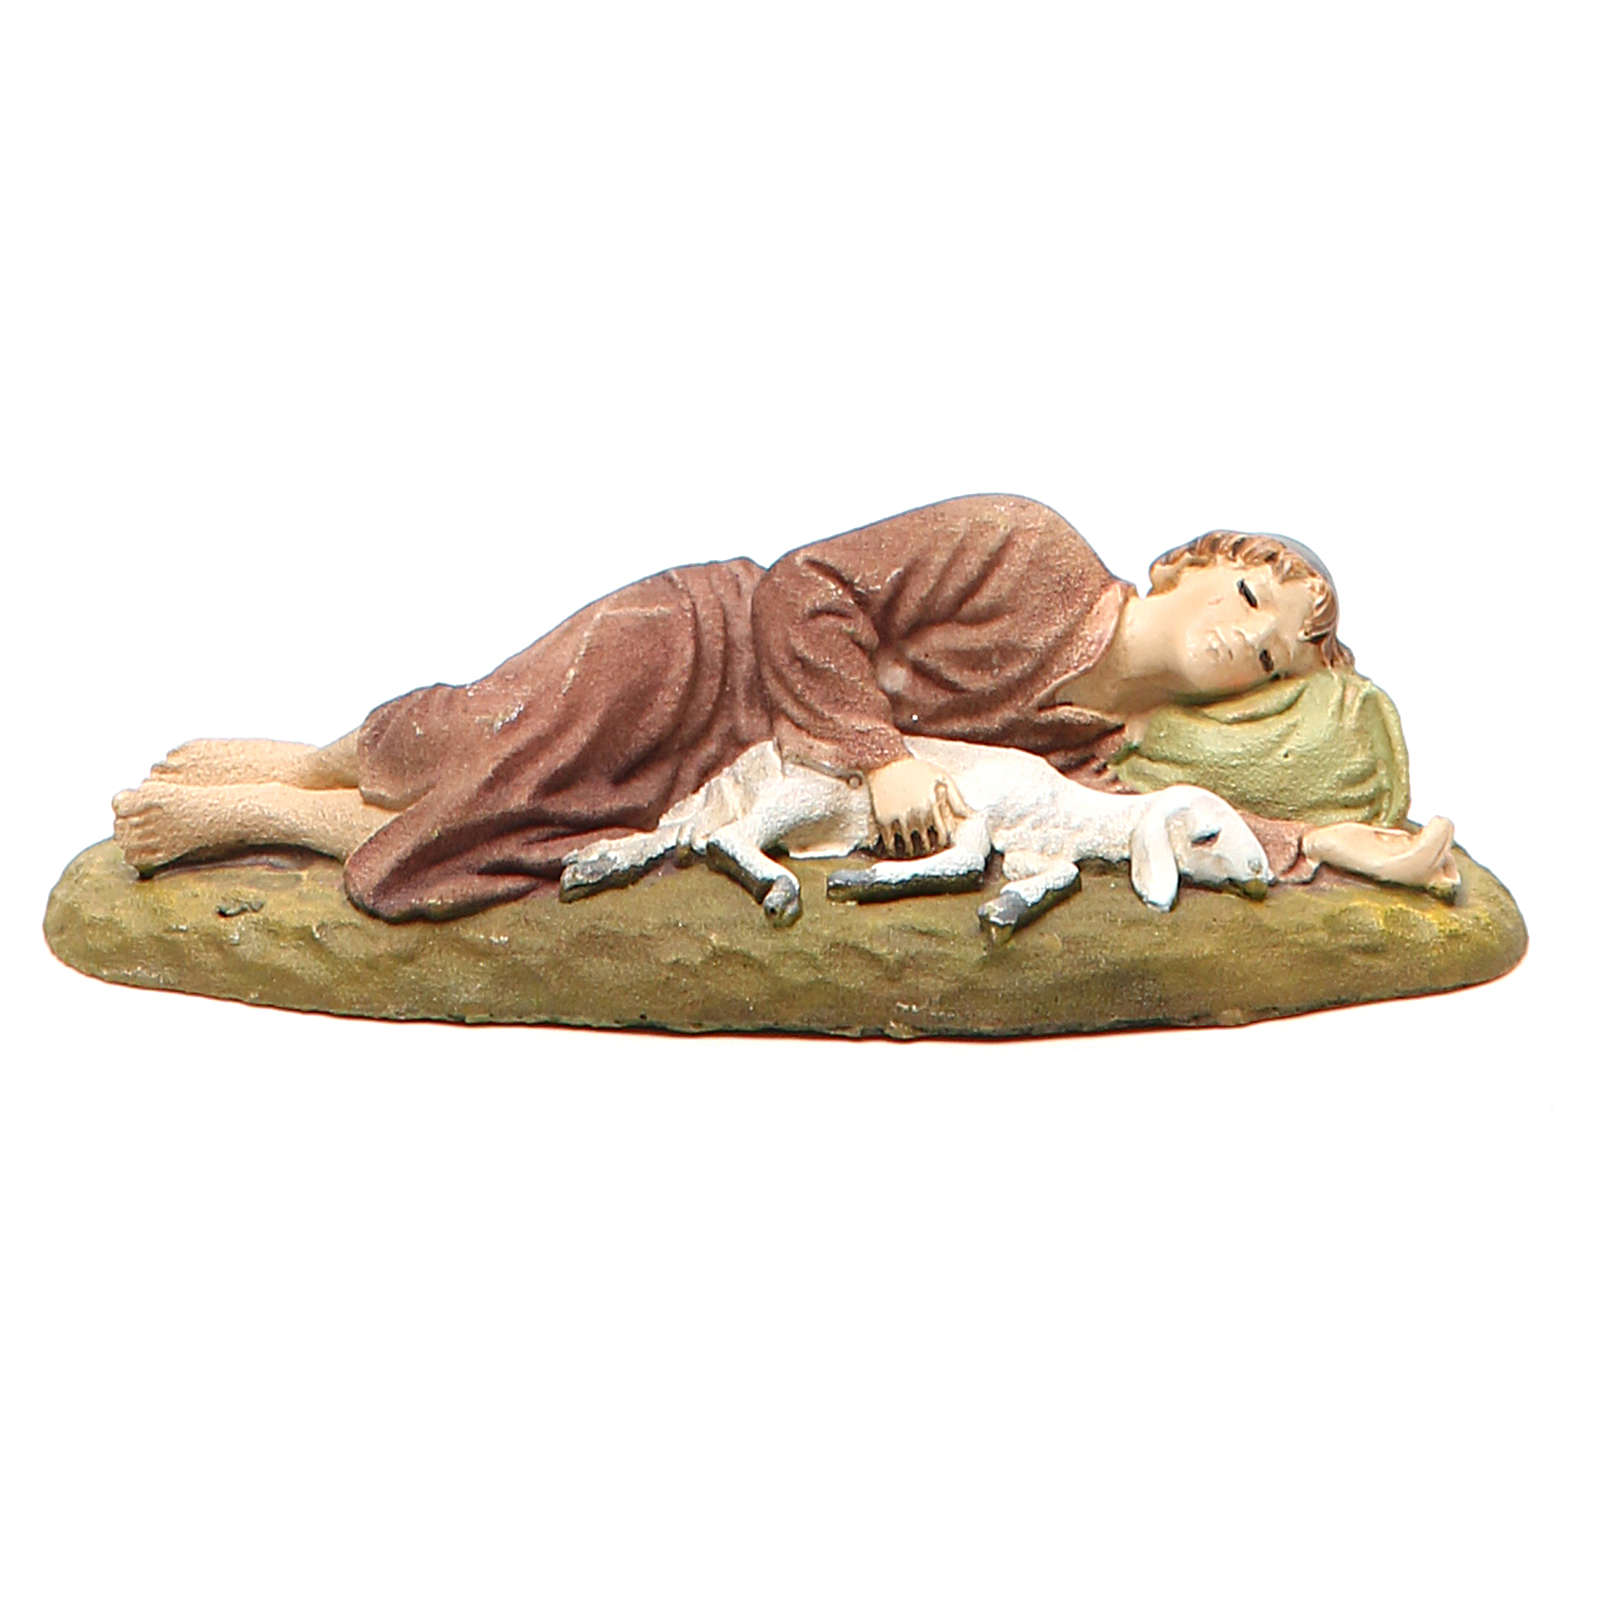 Pastor durmiente resina dipinta cm 10 Línea Martino Landi 3